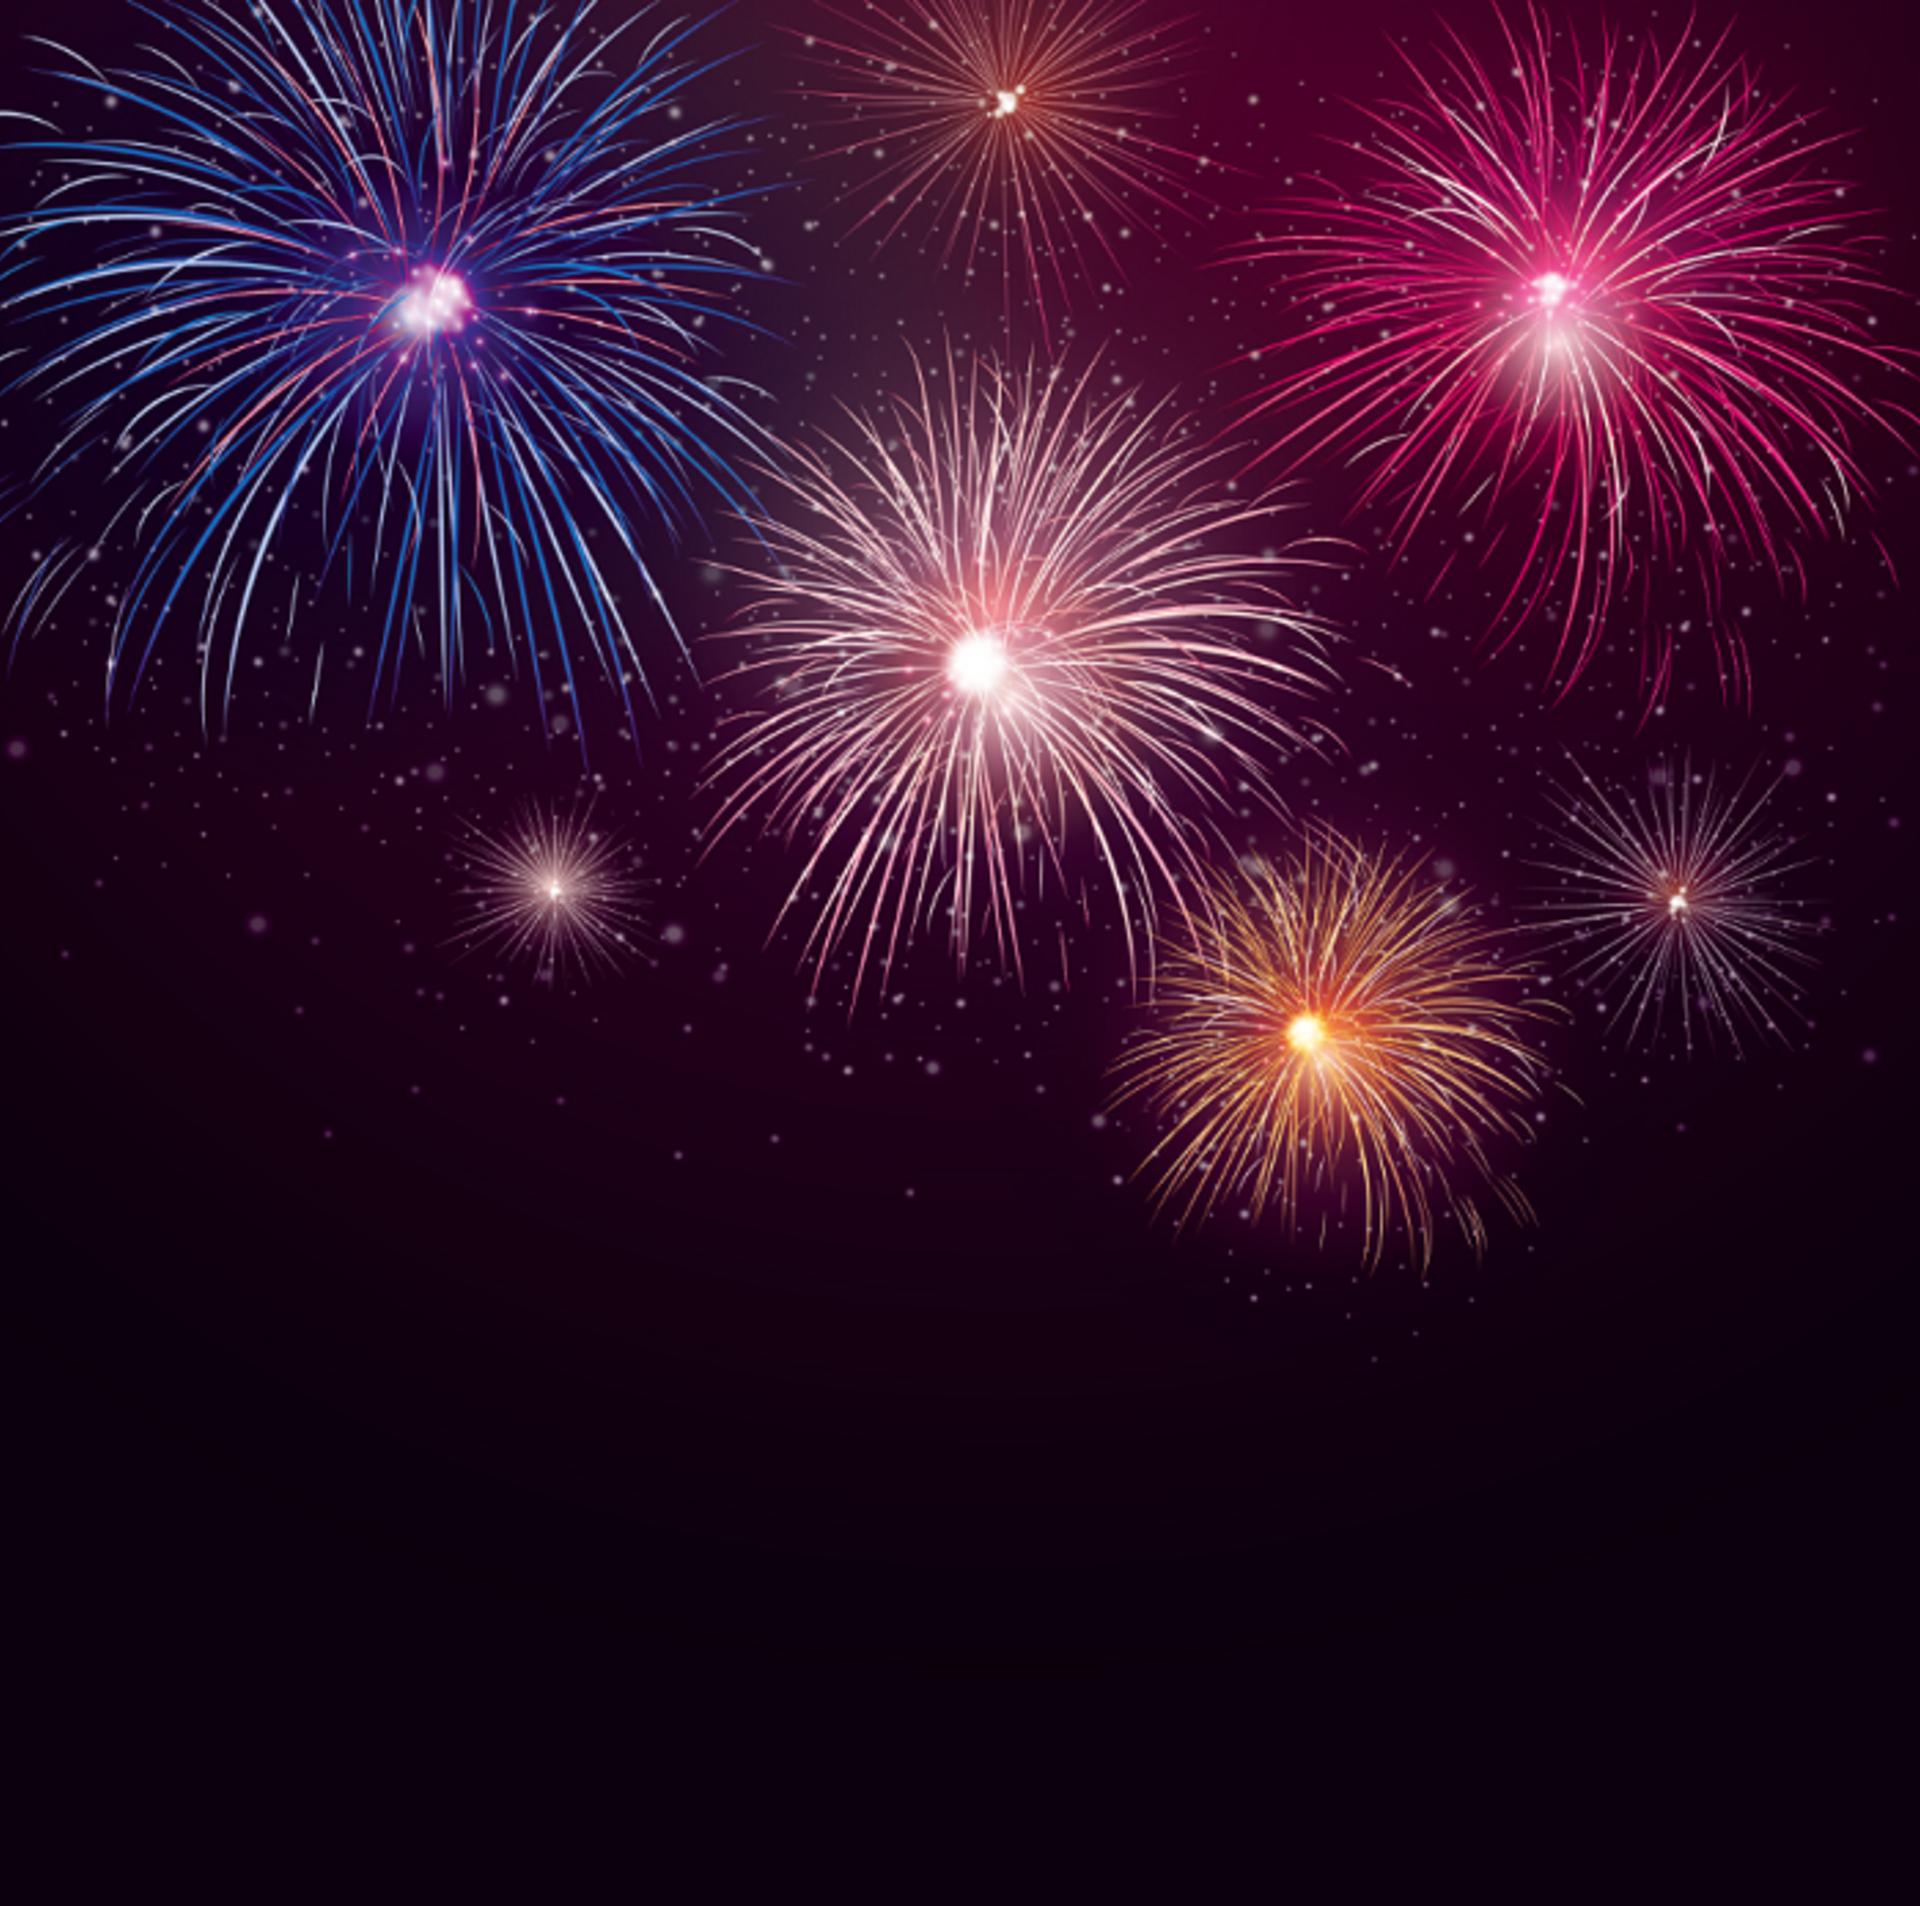 2018 Lake Havasu July 4th Fireworks Show